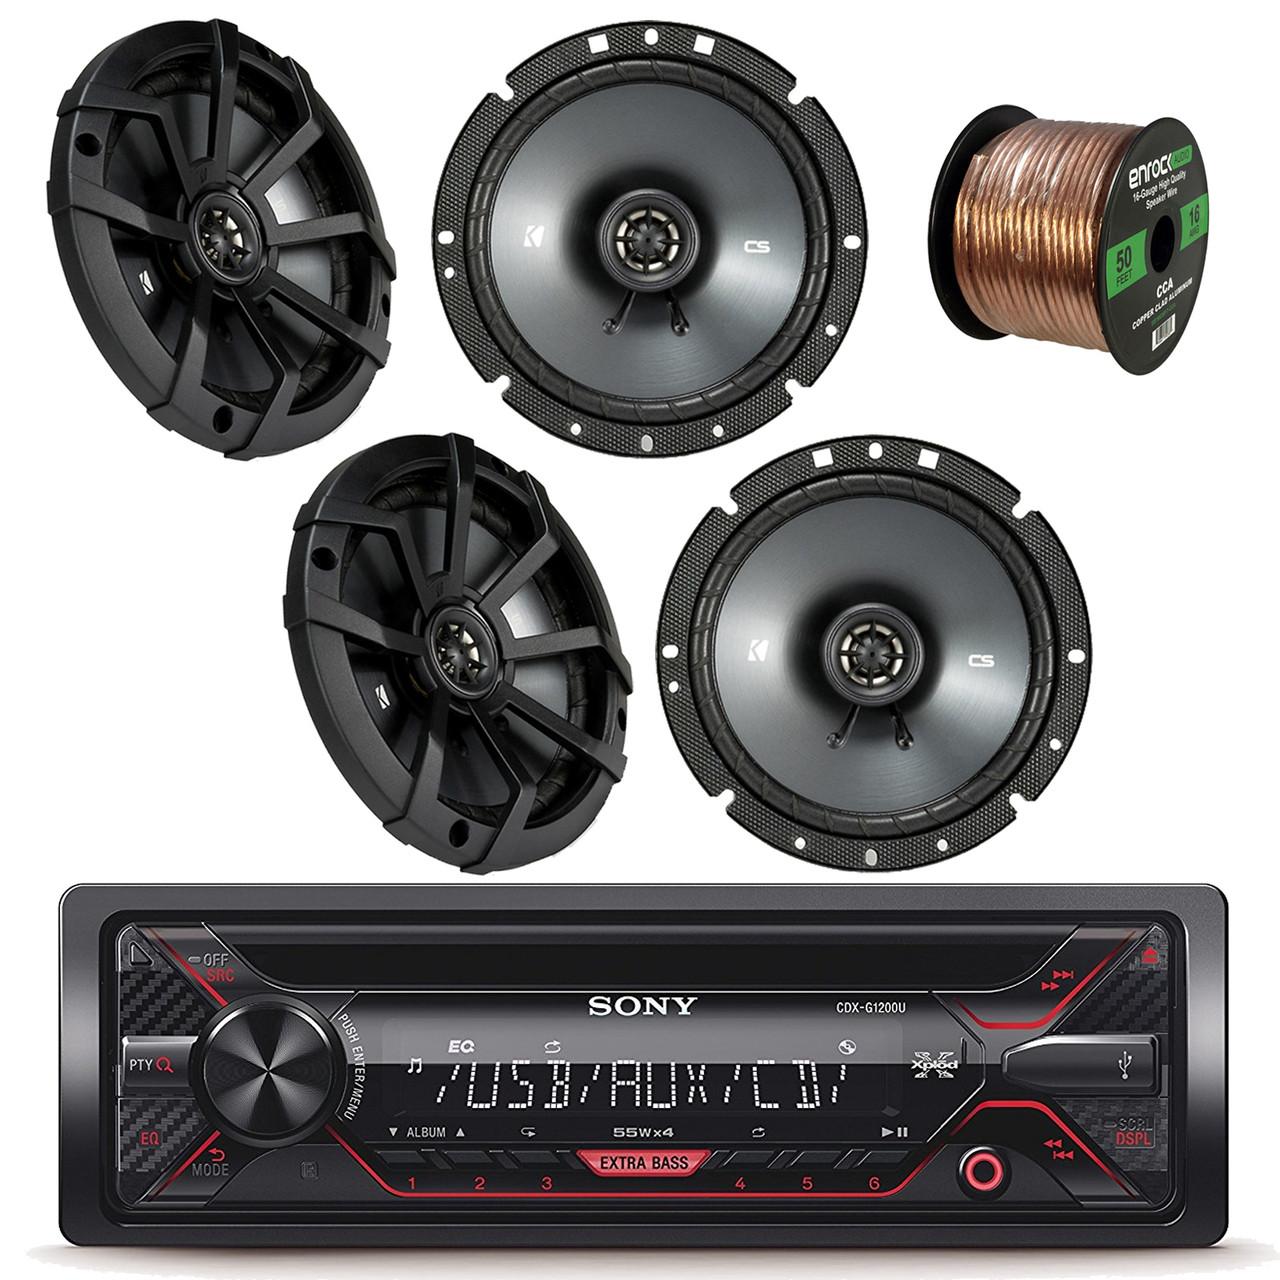 sony xplod cdxg1200u receiver with 52x4 watt amp with kicker 43csc674 6 3 4 inch 600 watt cs series black car coaxial speakers 2 pairs enrock audio  [ 1280 x 1280 Pixel ]